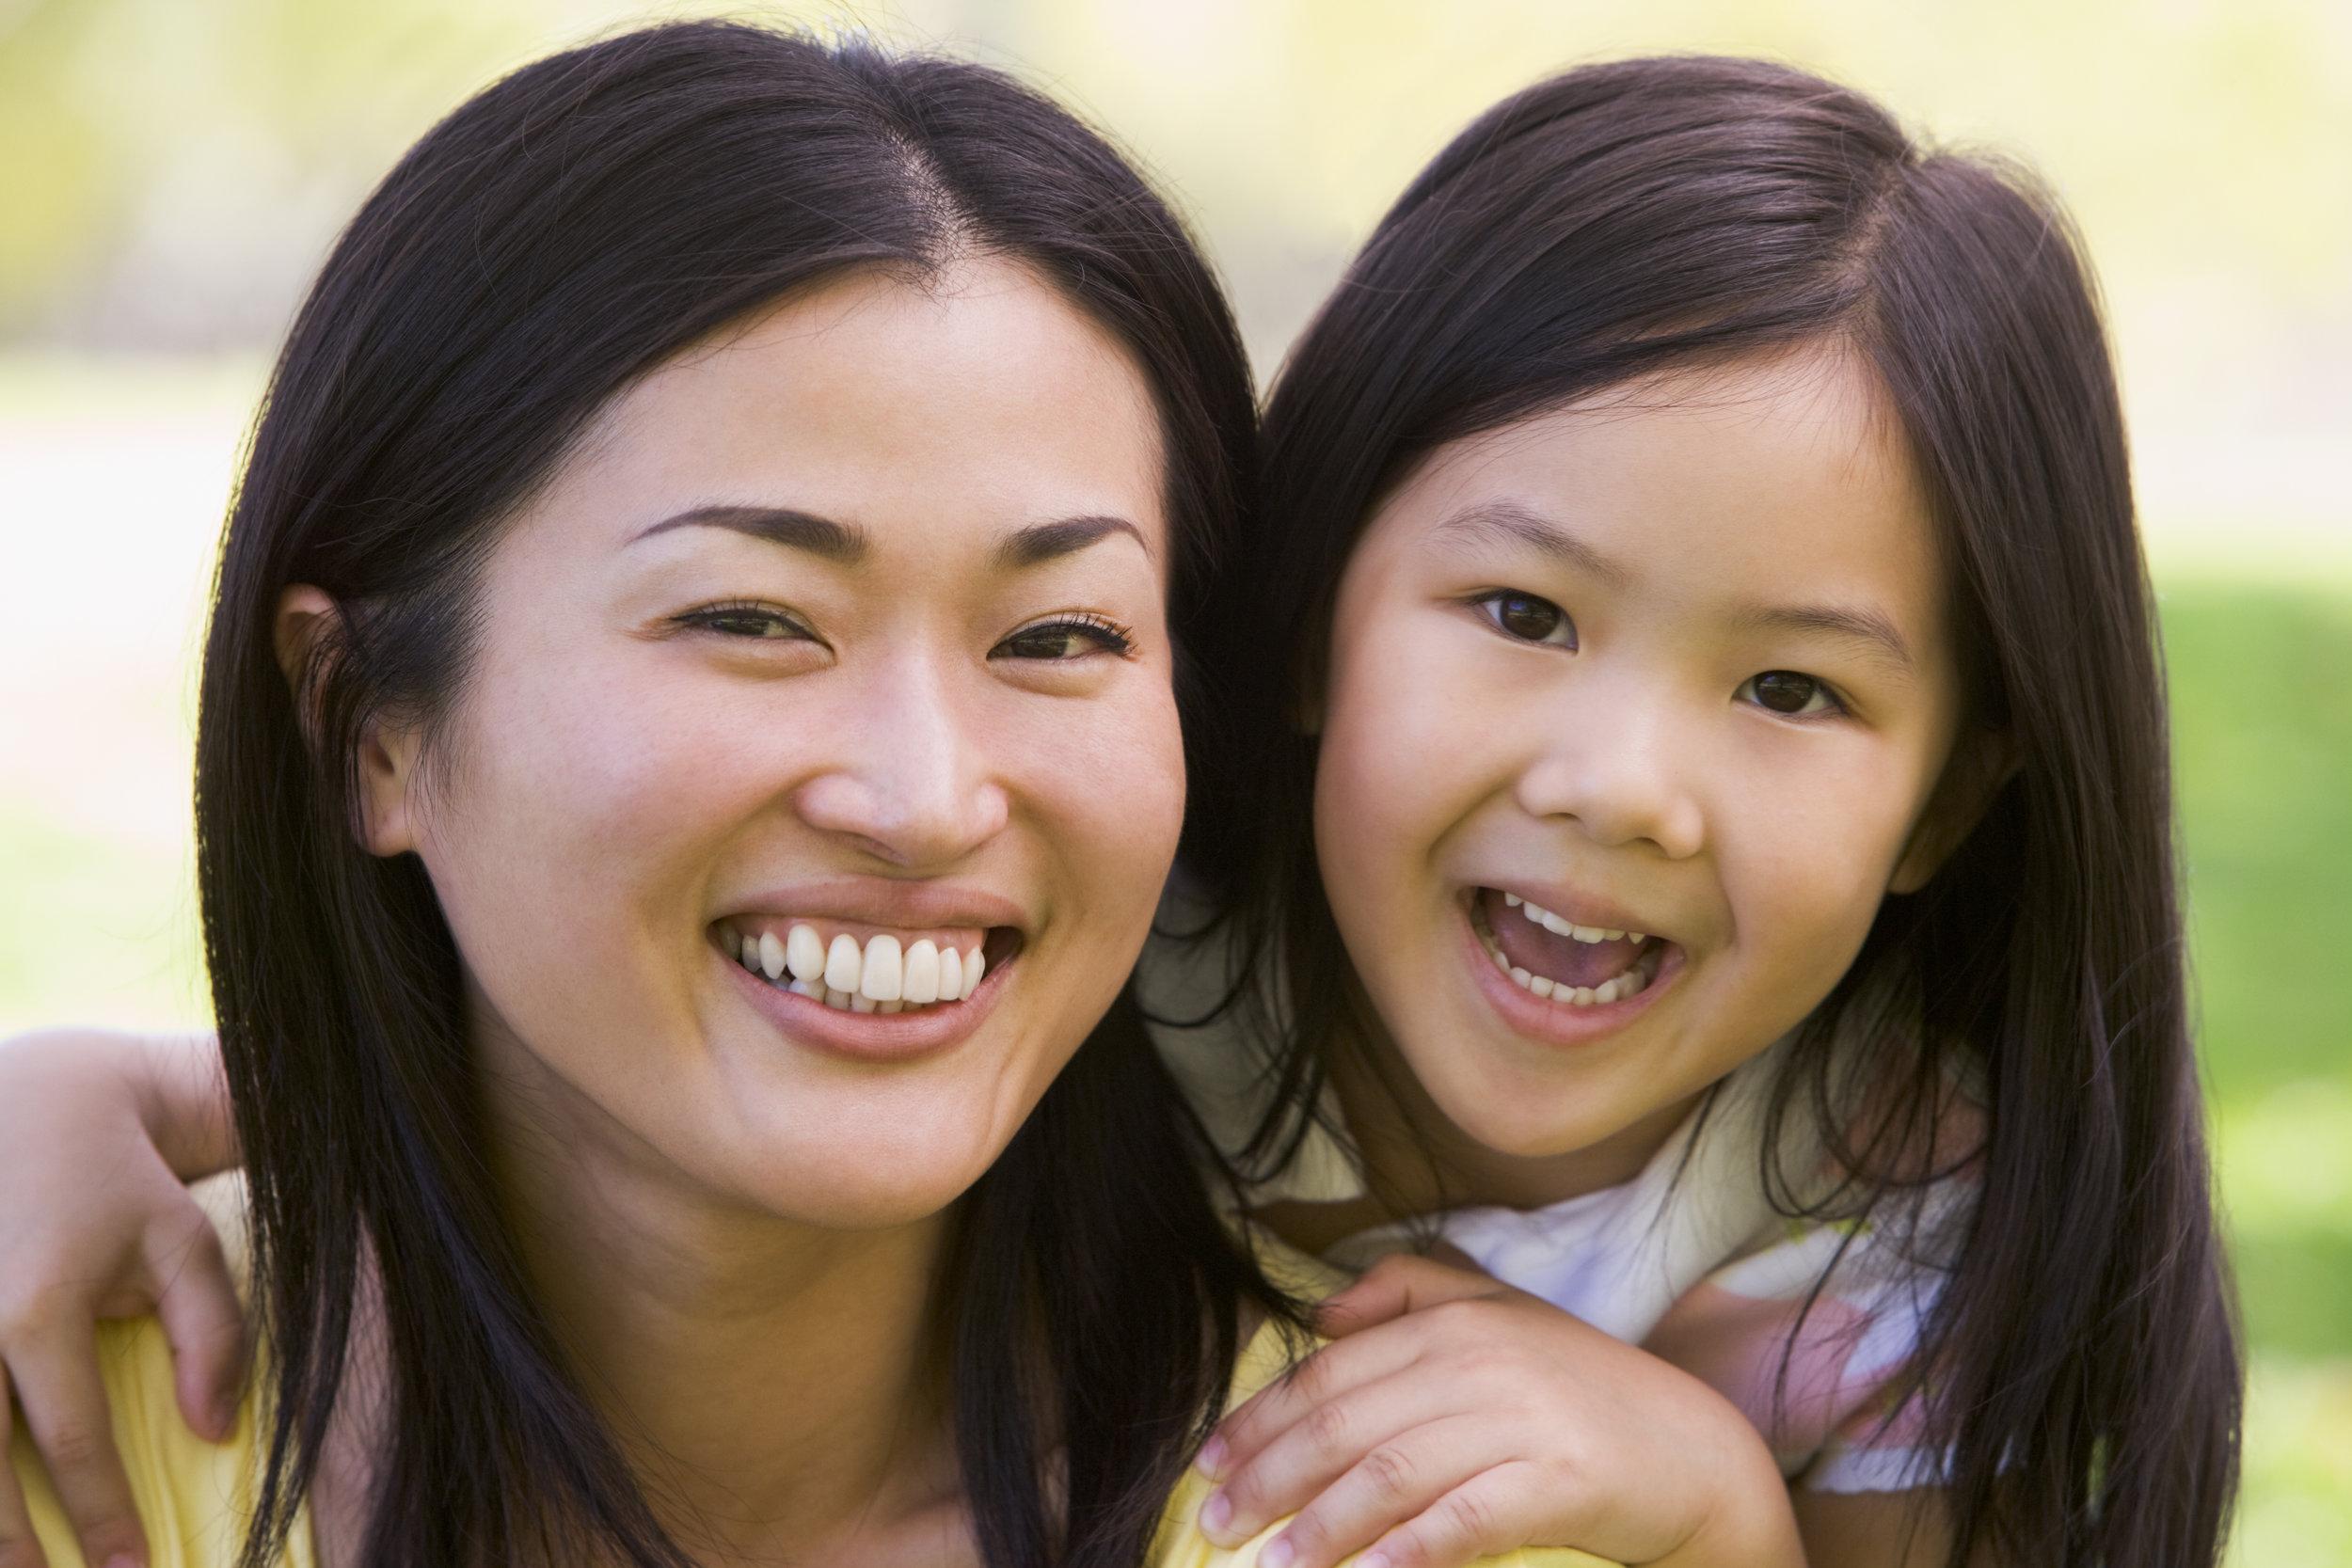 woman-and-young-girl-outdoors-embracing-and-smiling_rYZRXYCSj.jpg